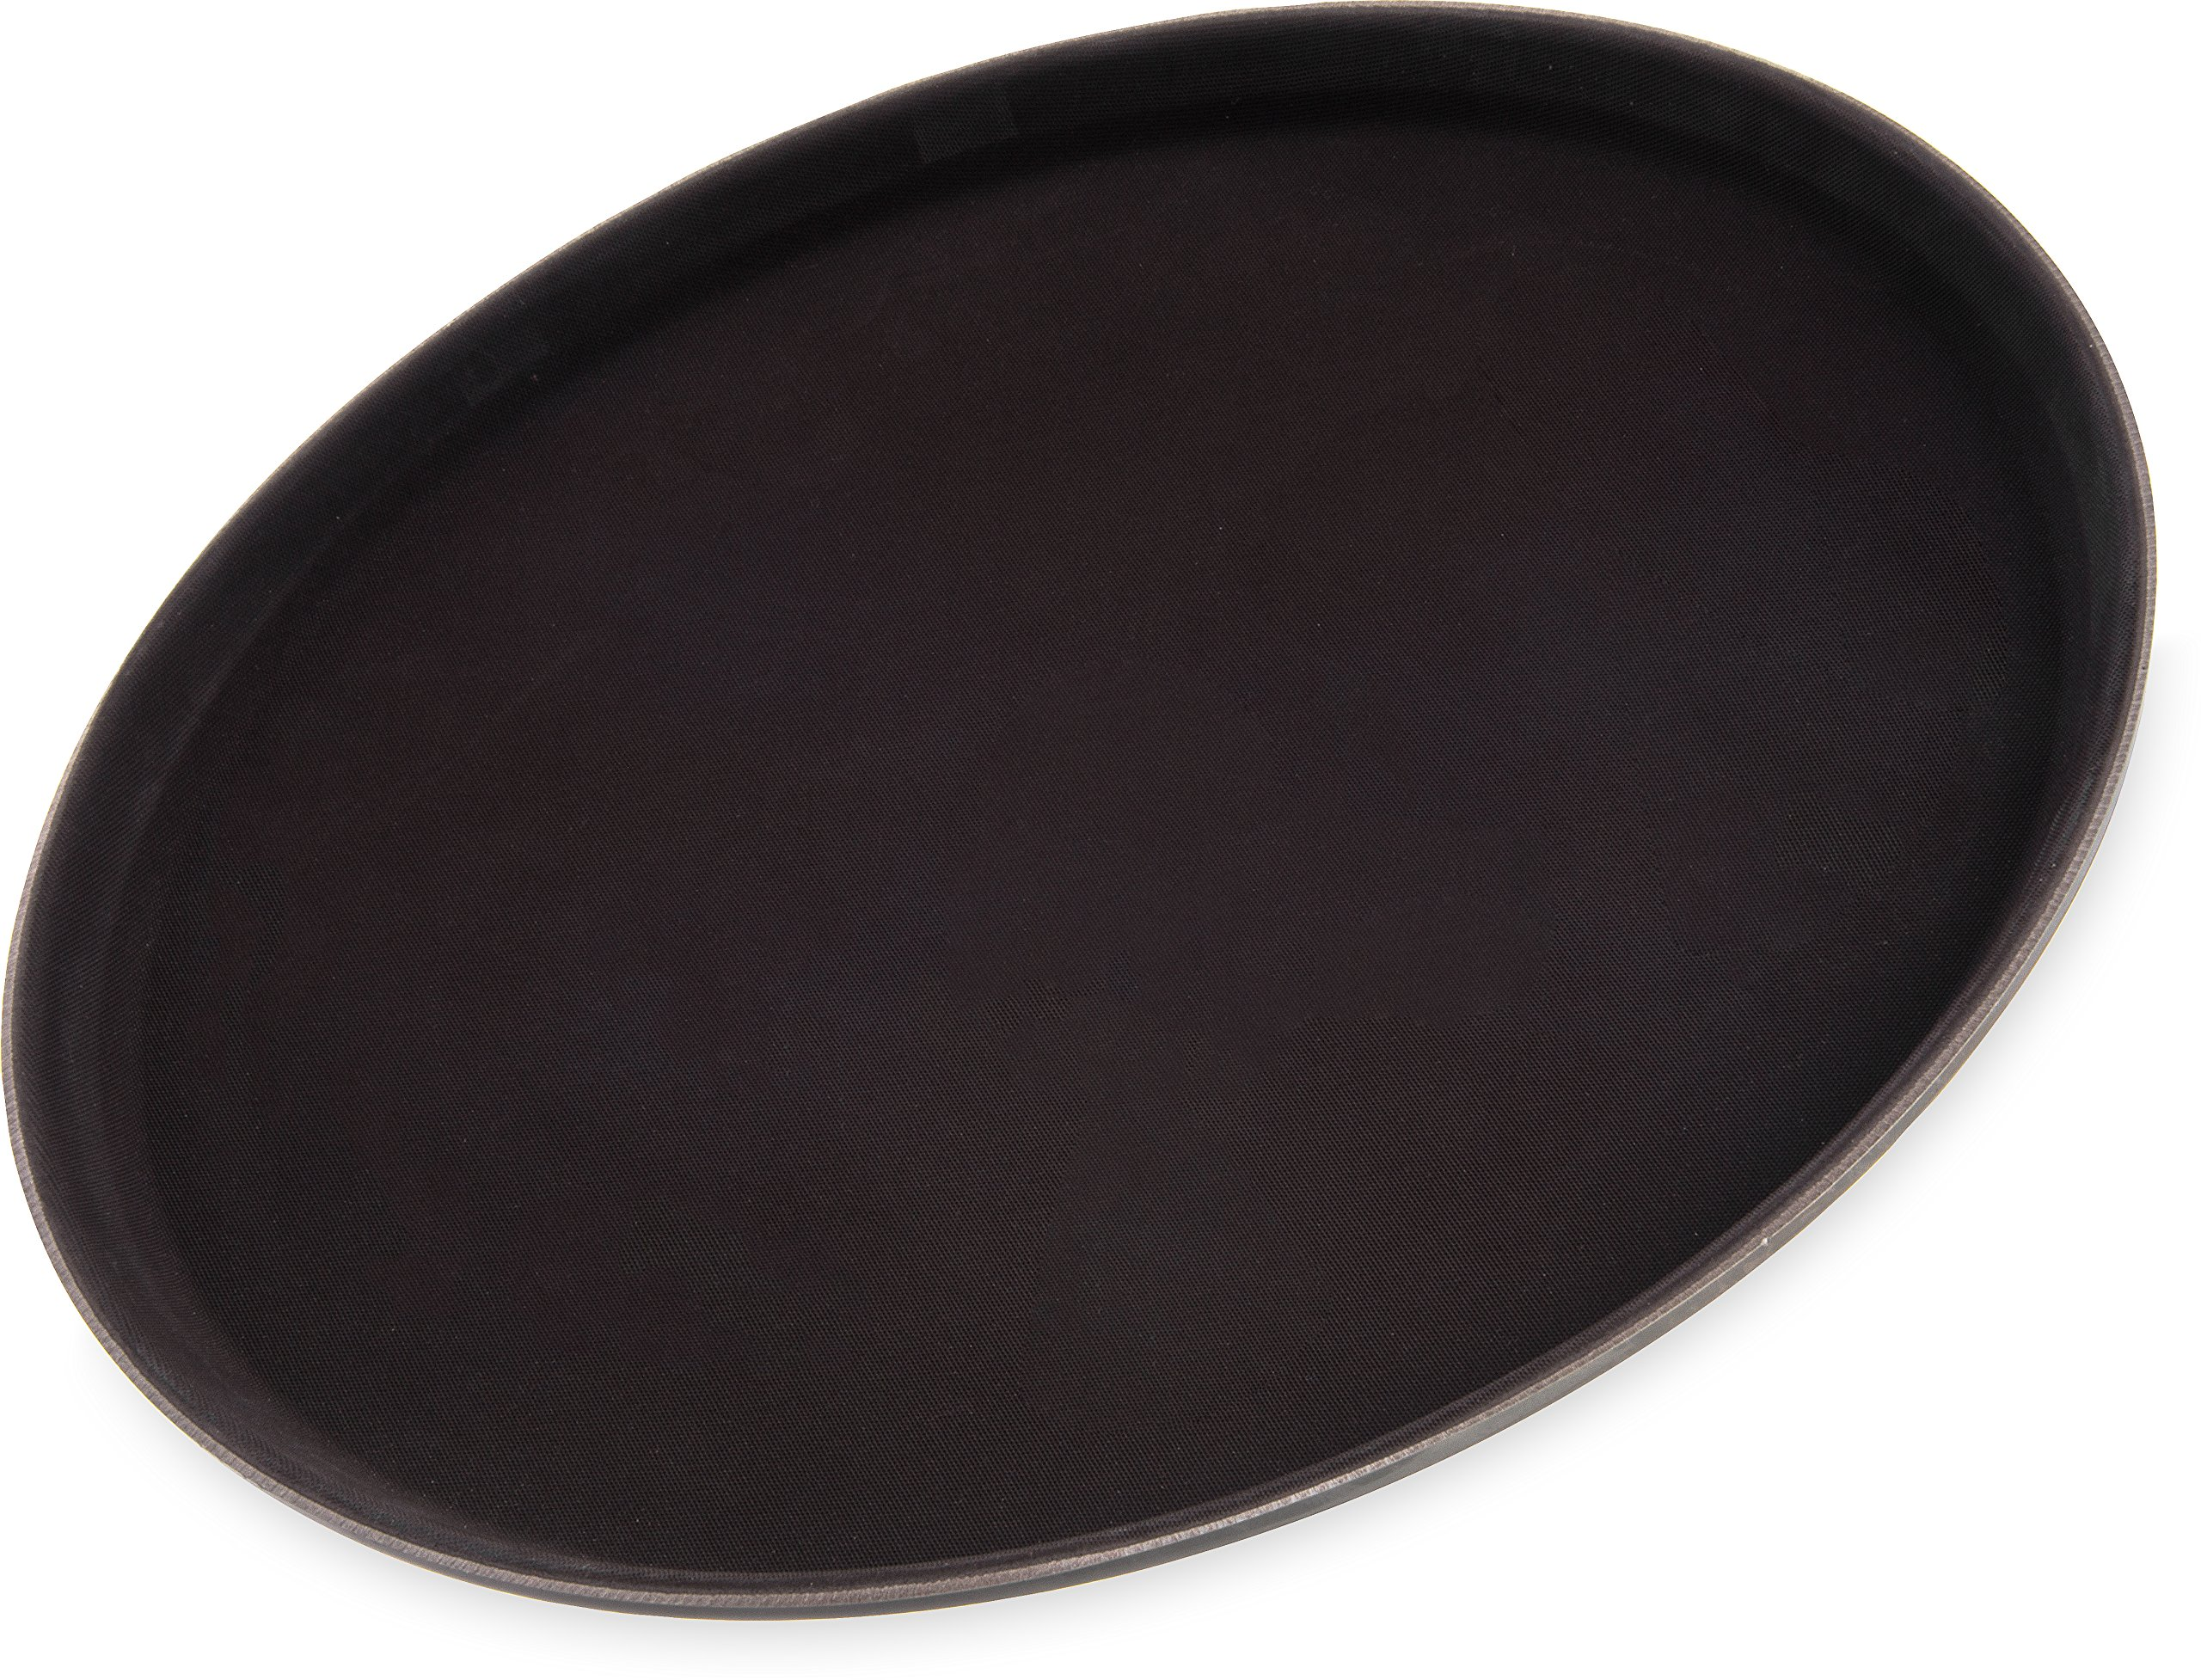 Carlisle 1400GL076 GripLite Rubber Lined Non-Slip Round Serving Tray, 14'' Diameter, Tan (Pack of 12)